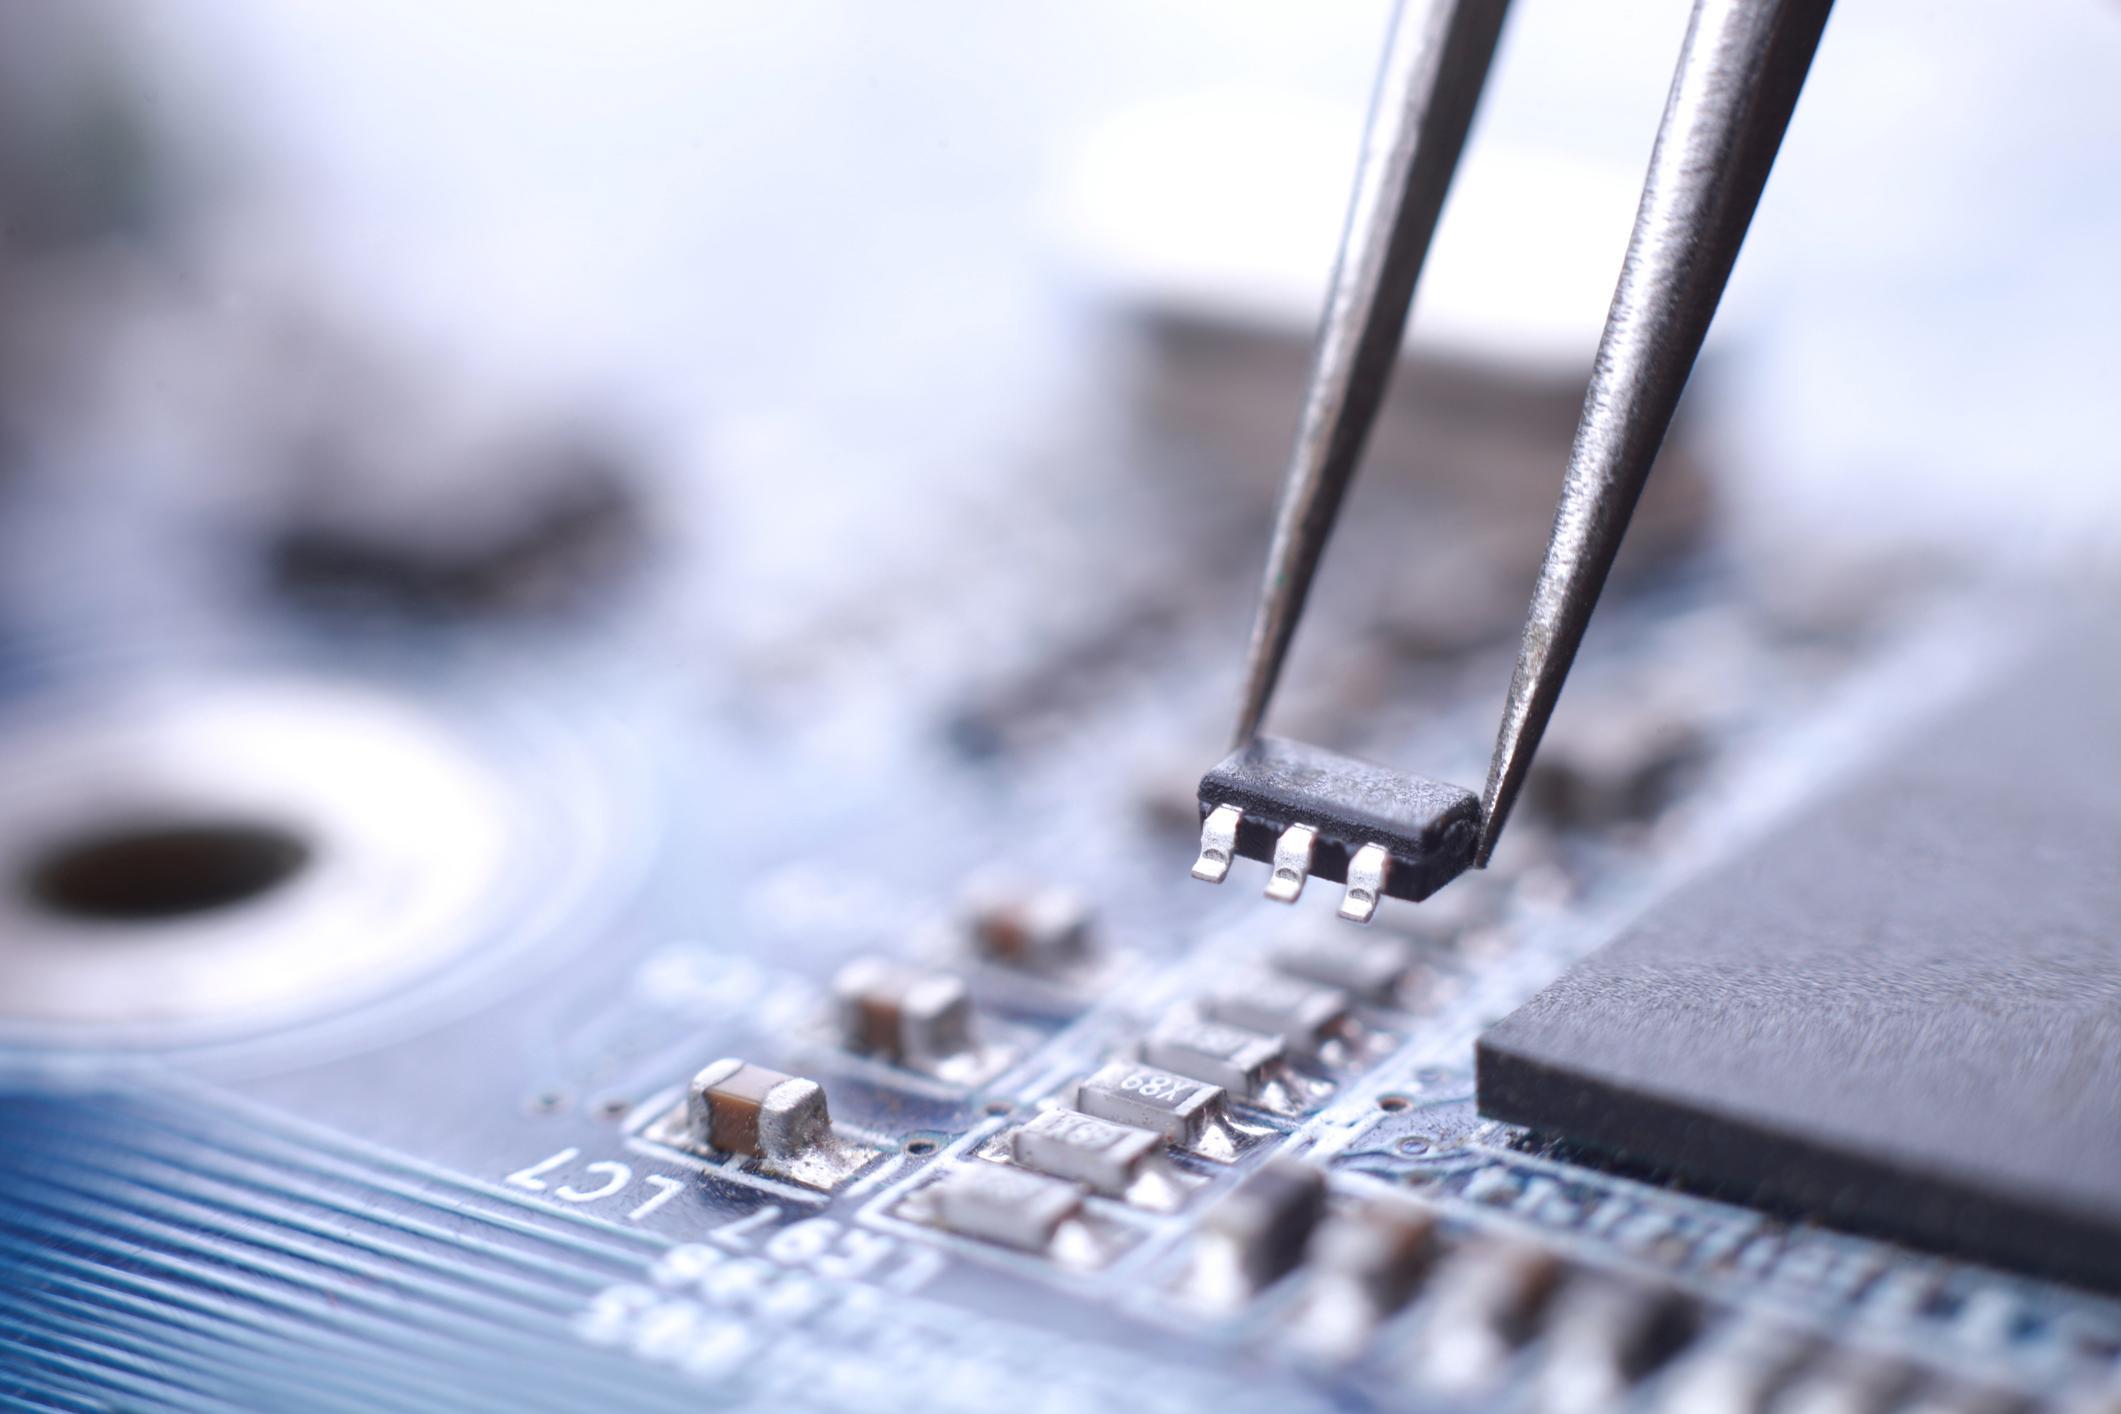 Using tweezers, a technician is installing a microchip on a circuit board.